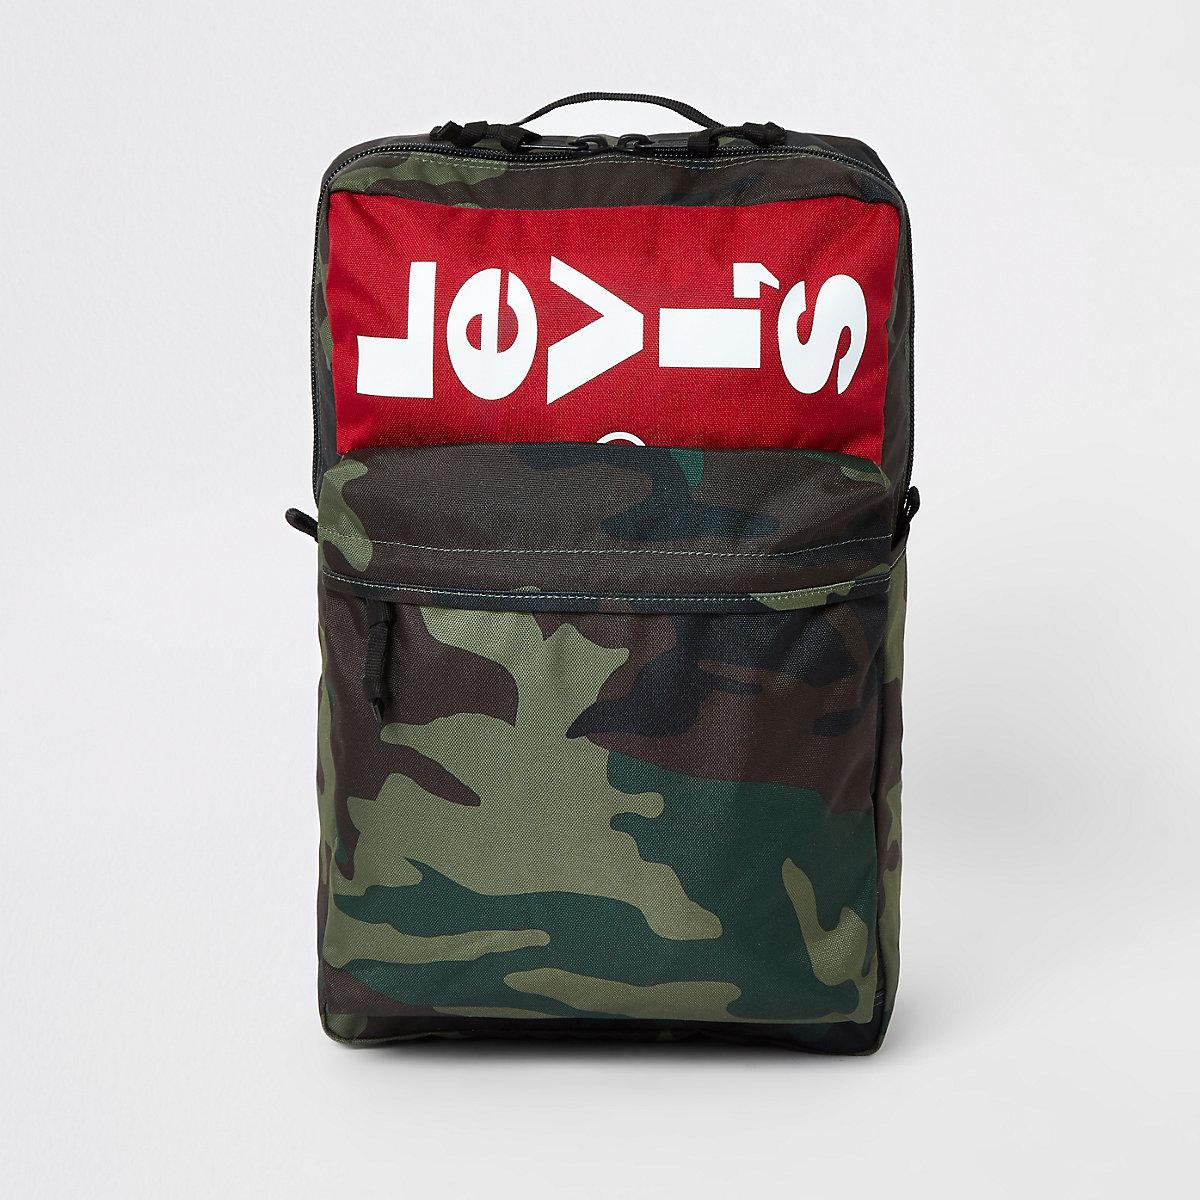 Levi's khaki camo backpack